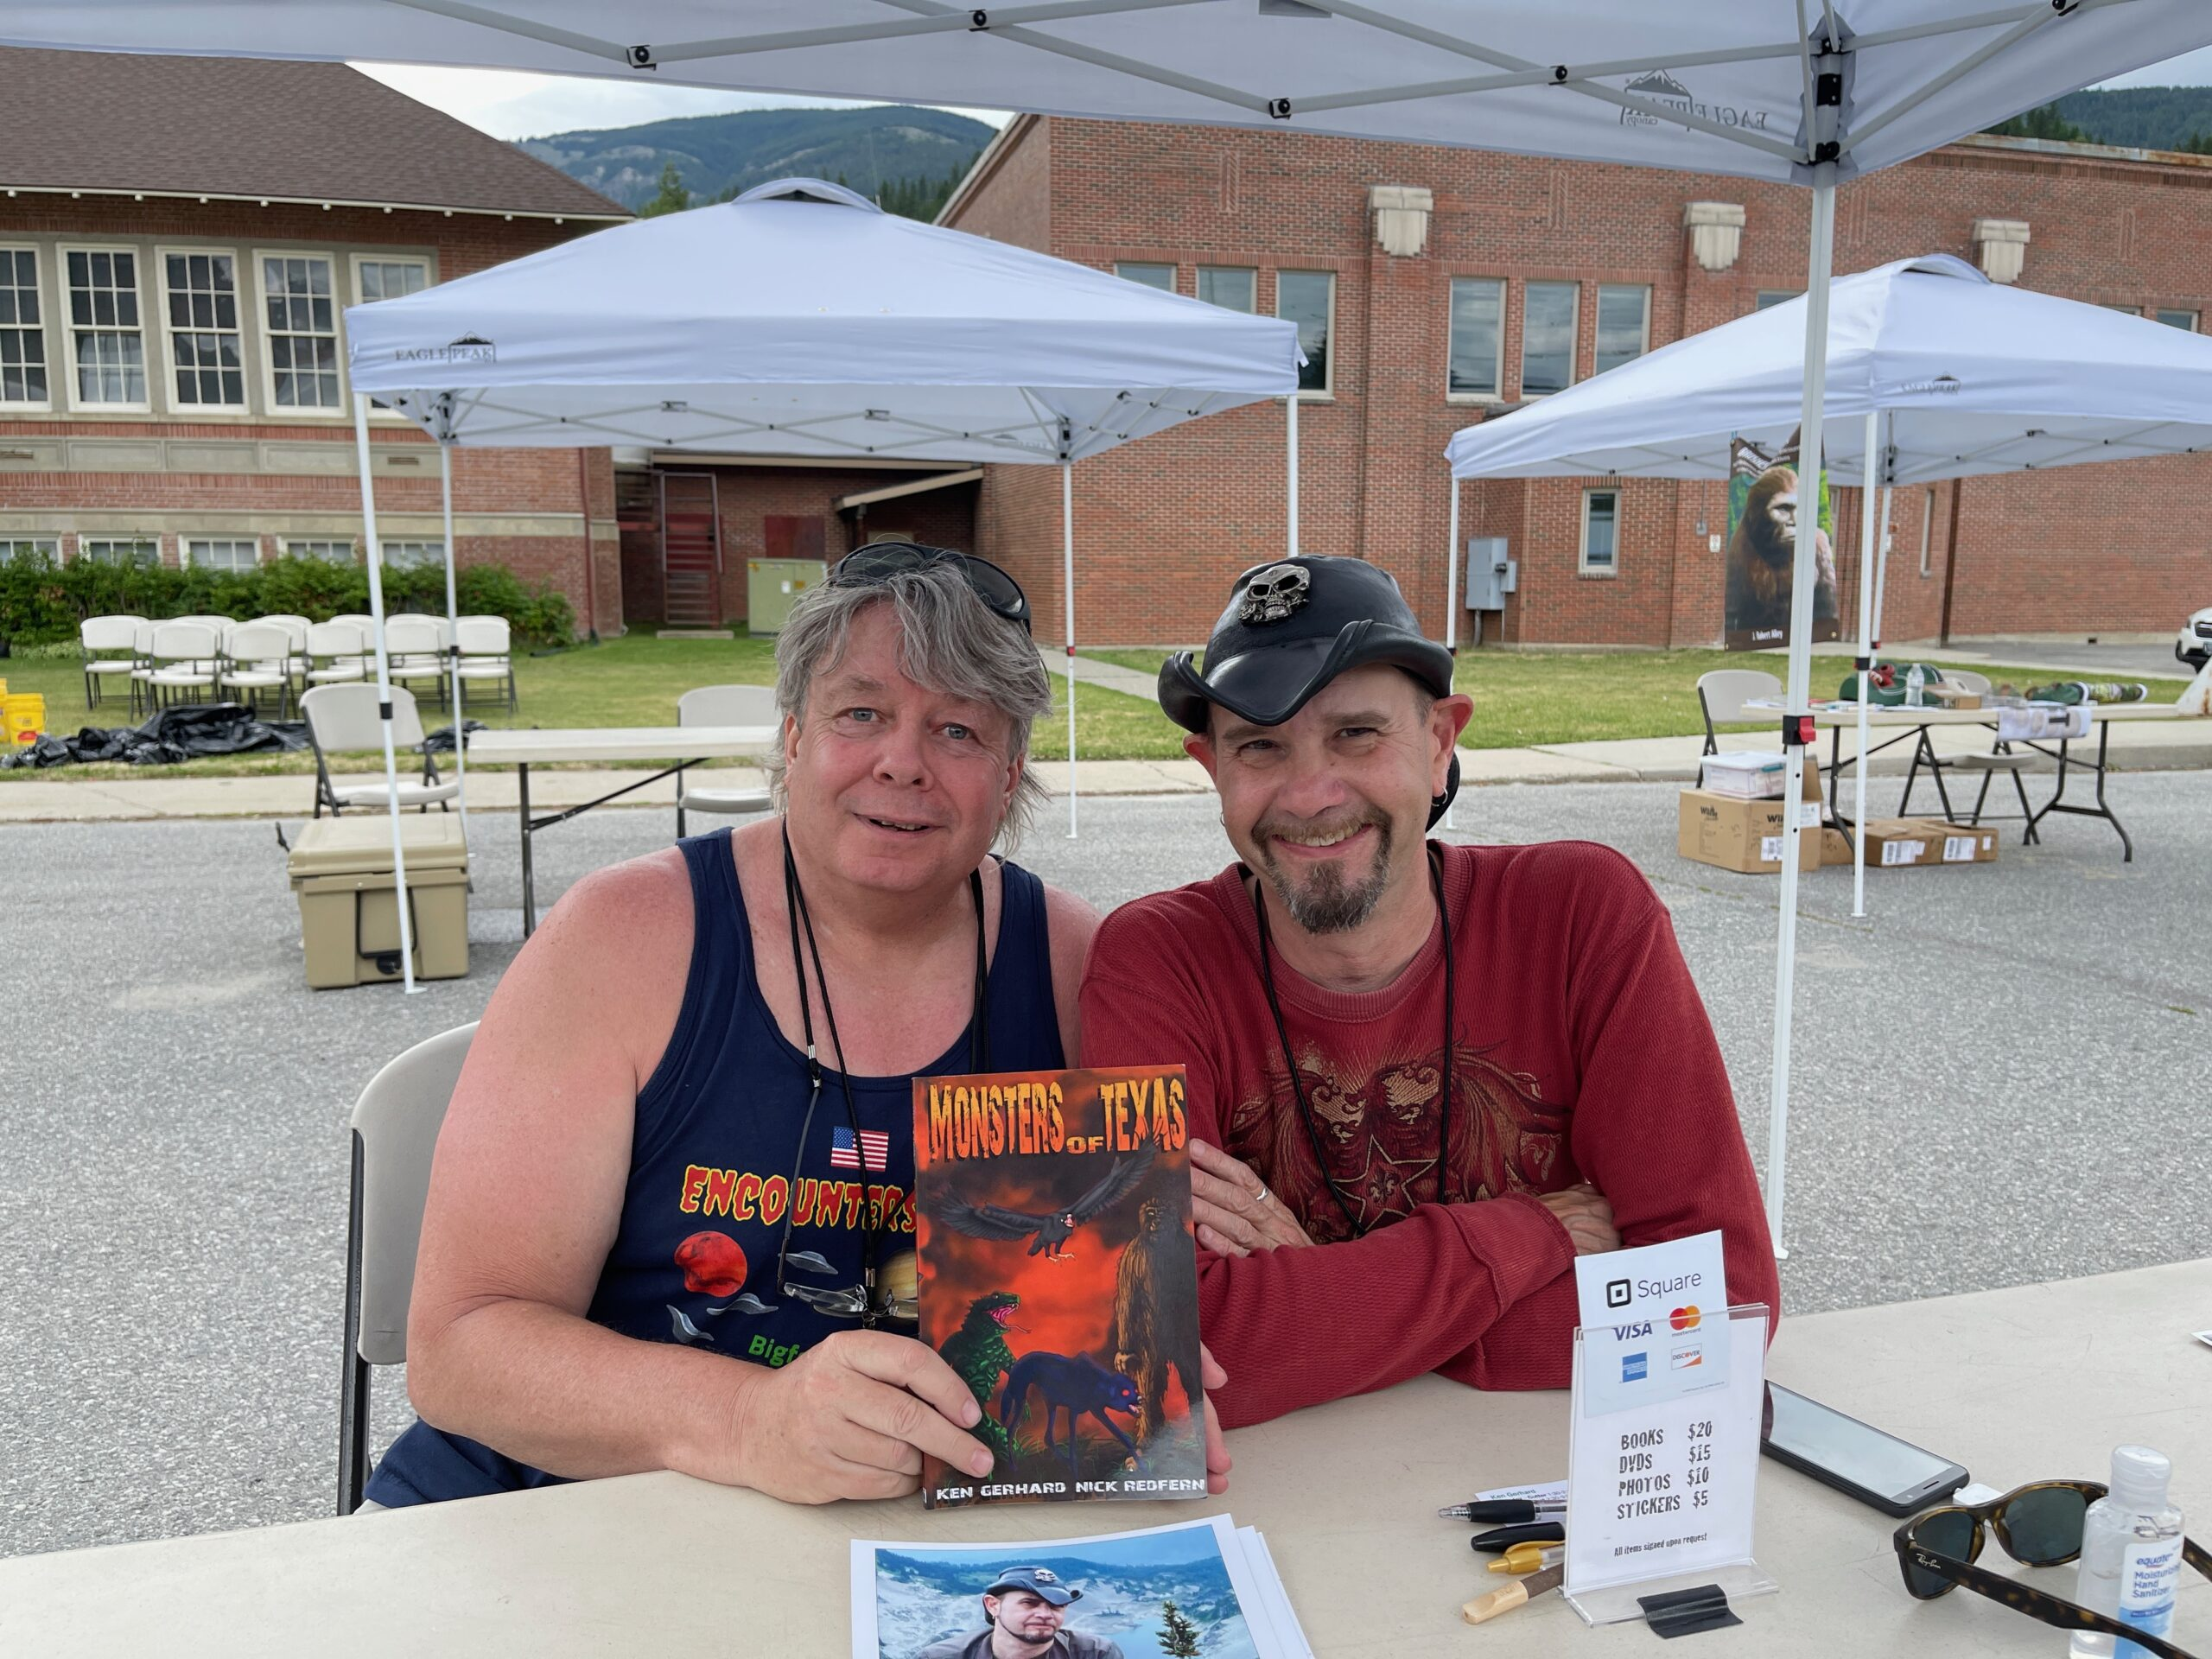 Metaline Falls Bigfoot Festival Press Pass Now On Vimeo!